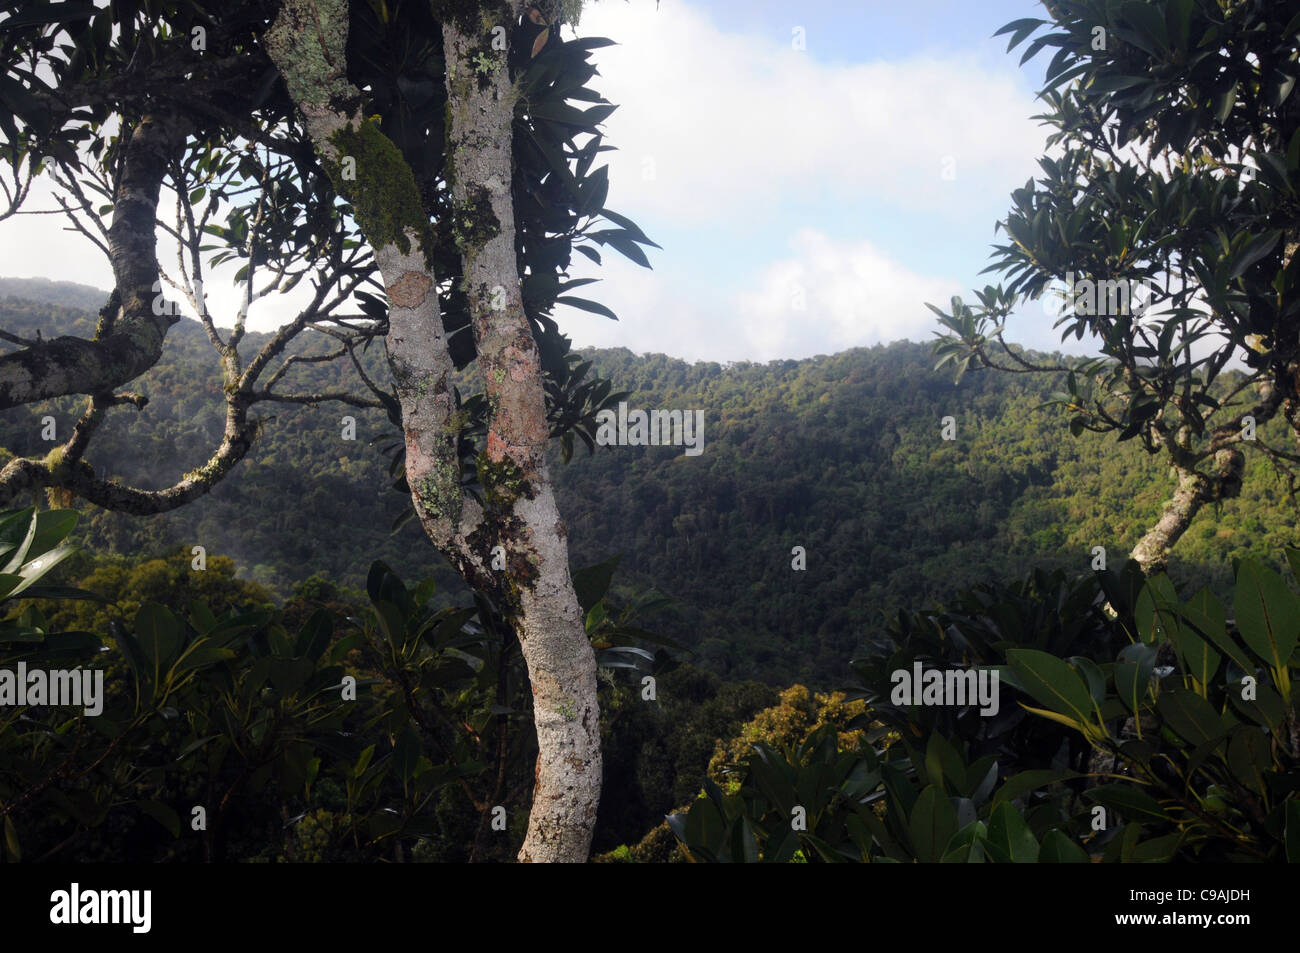 Oreillys Stock Photos & Oreillys Stock Images - Alamy